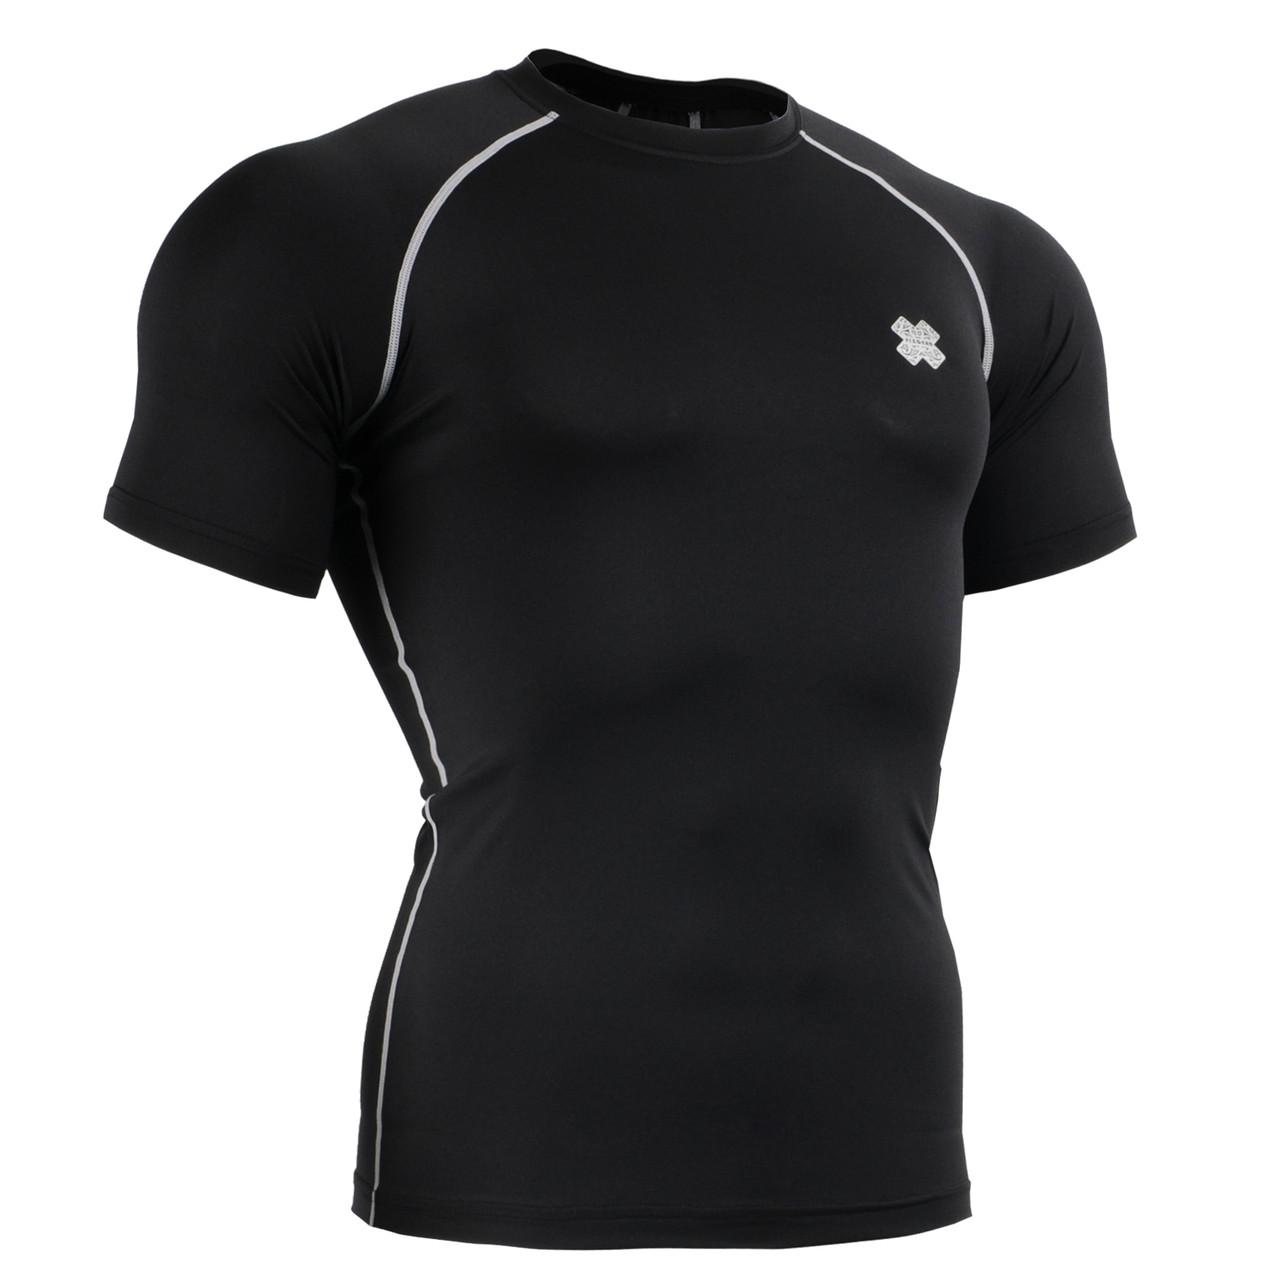 Компресійна футболка рашгард Fixgear CPS-BS чорна